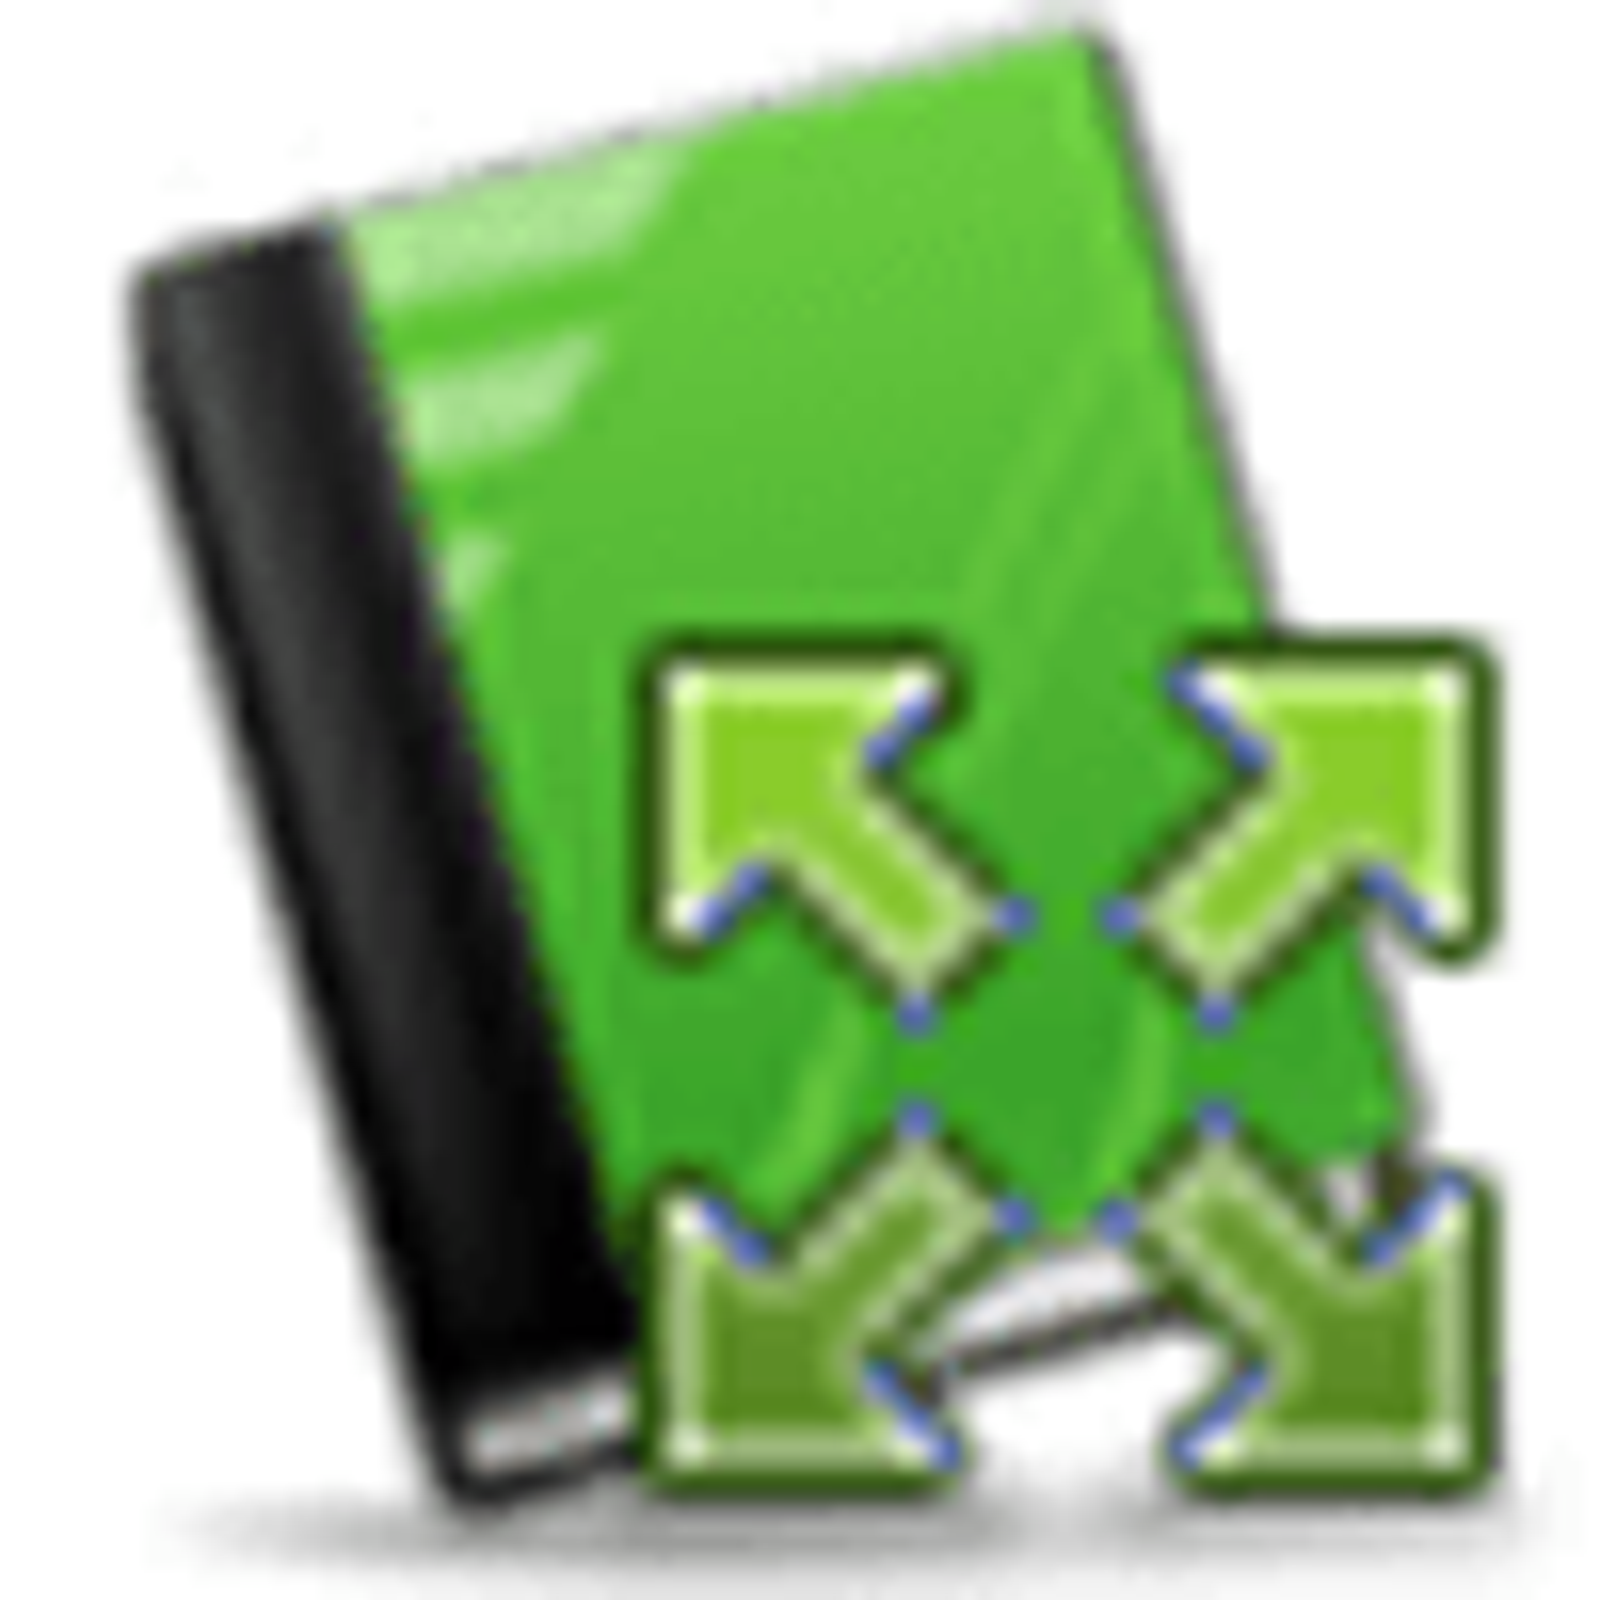 Kindle AZW DRM Removal